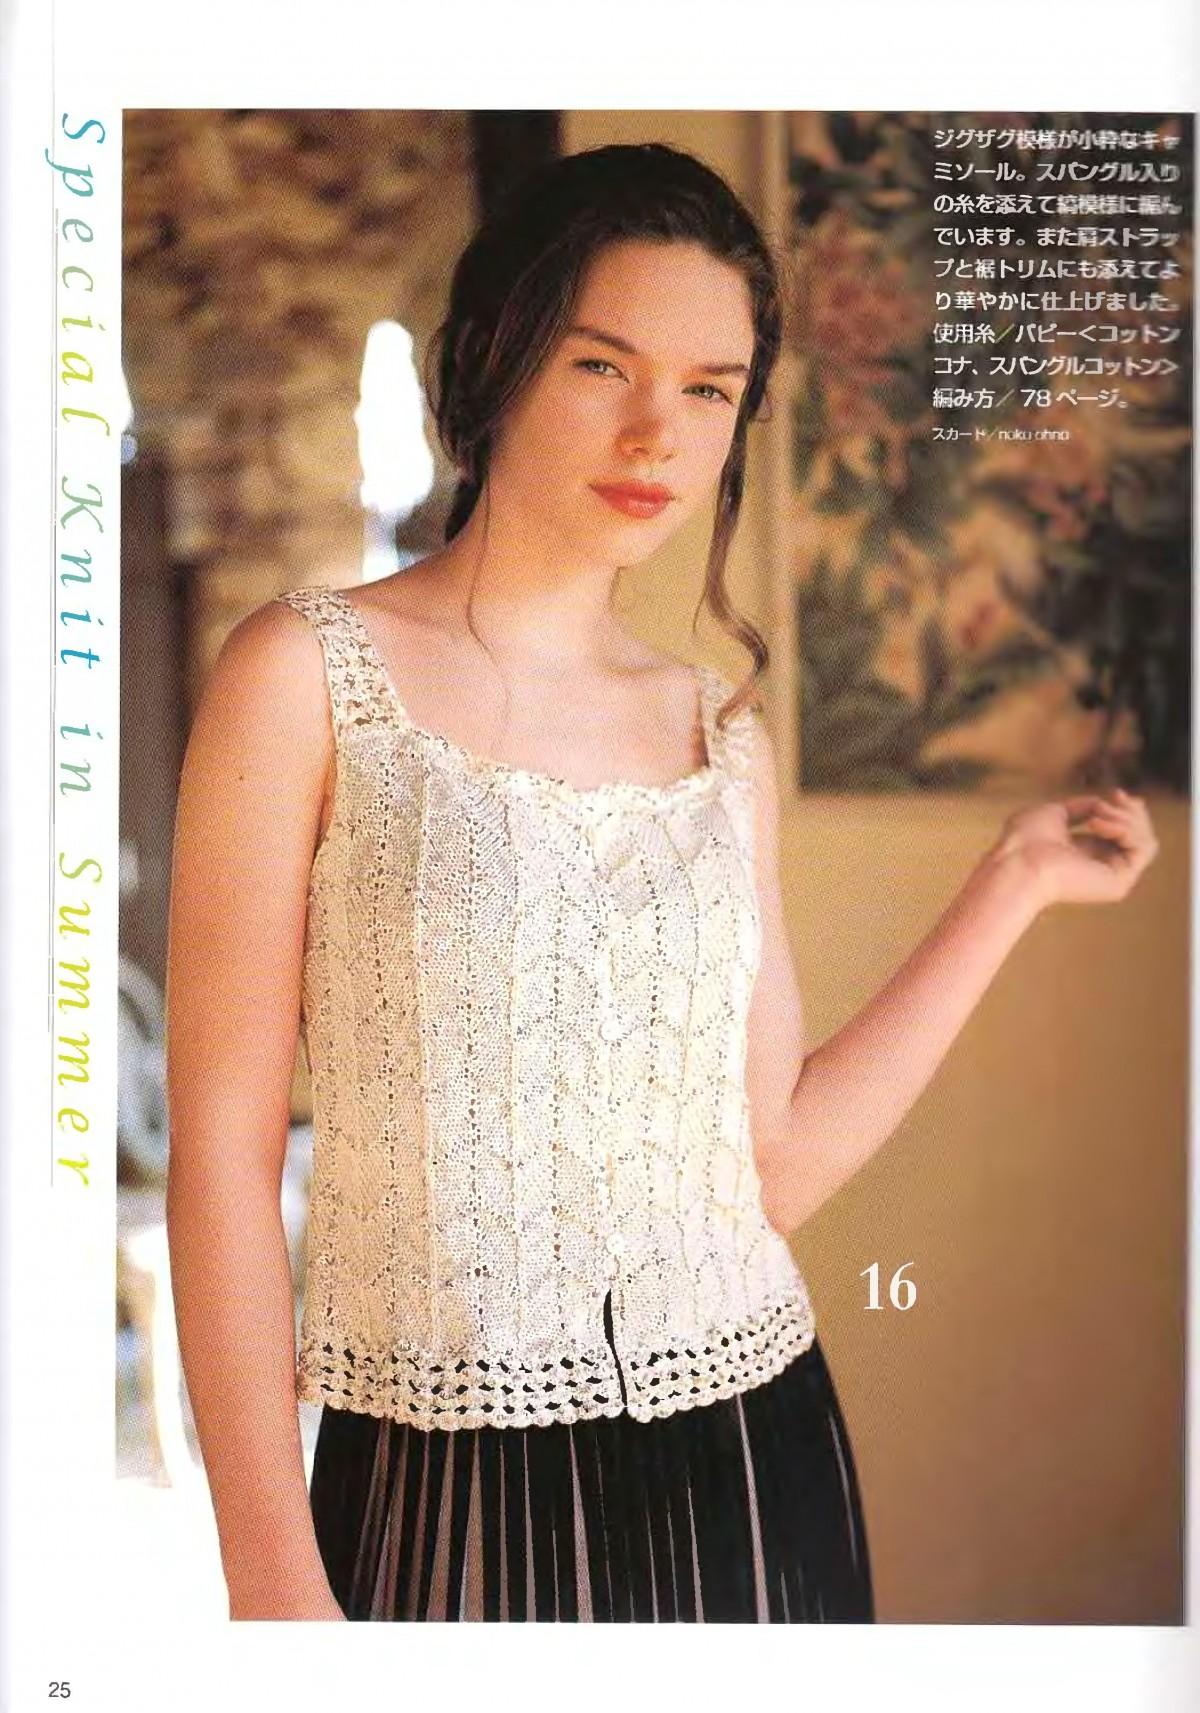 Lets-knit-series-NV4359-2008-Spring-Summer-sp-kr_23.jpg